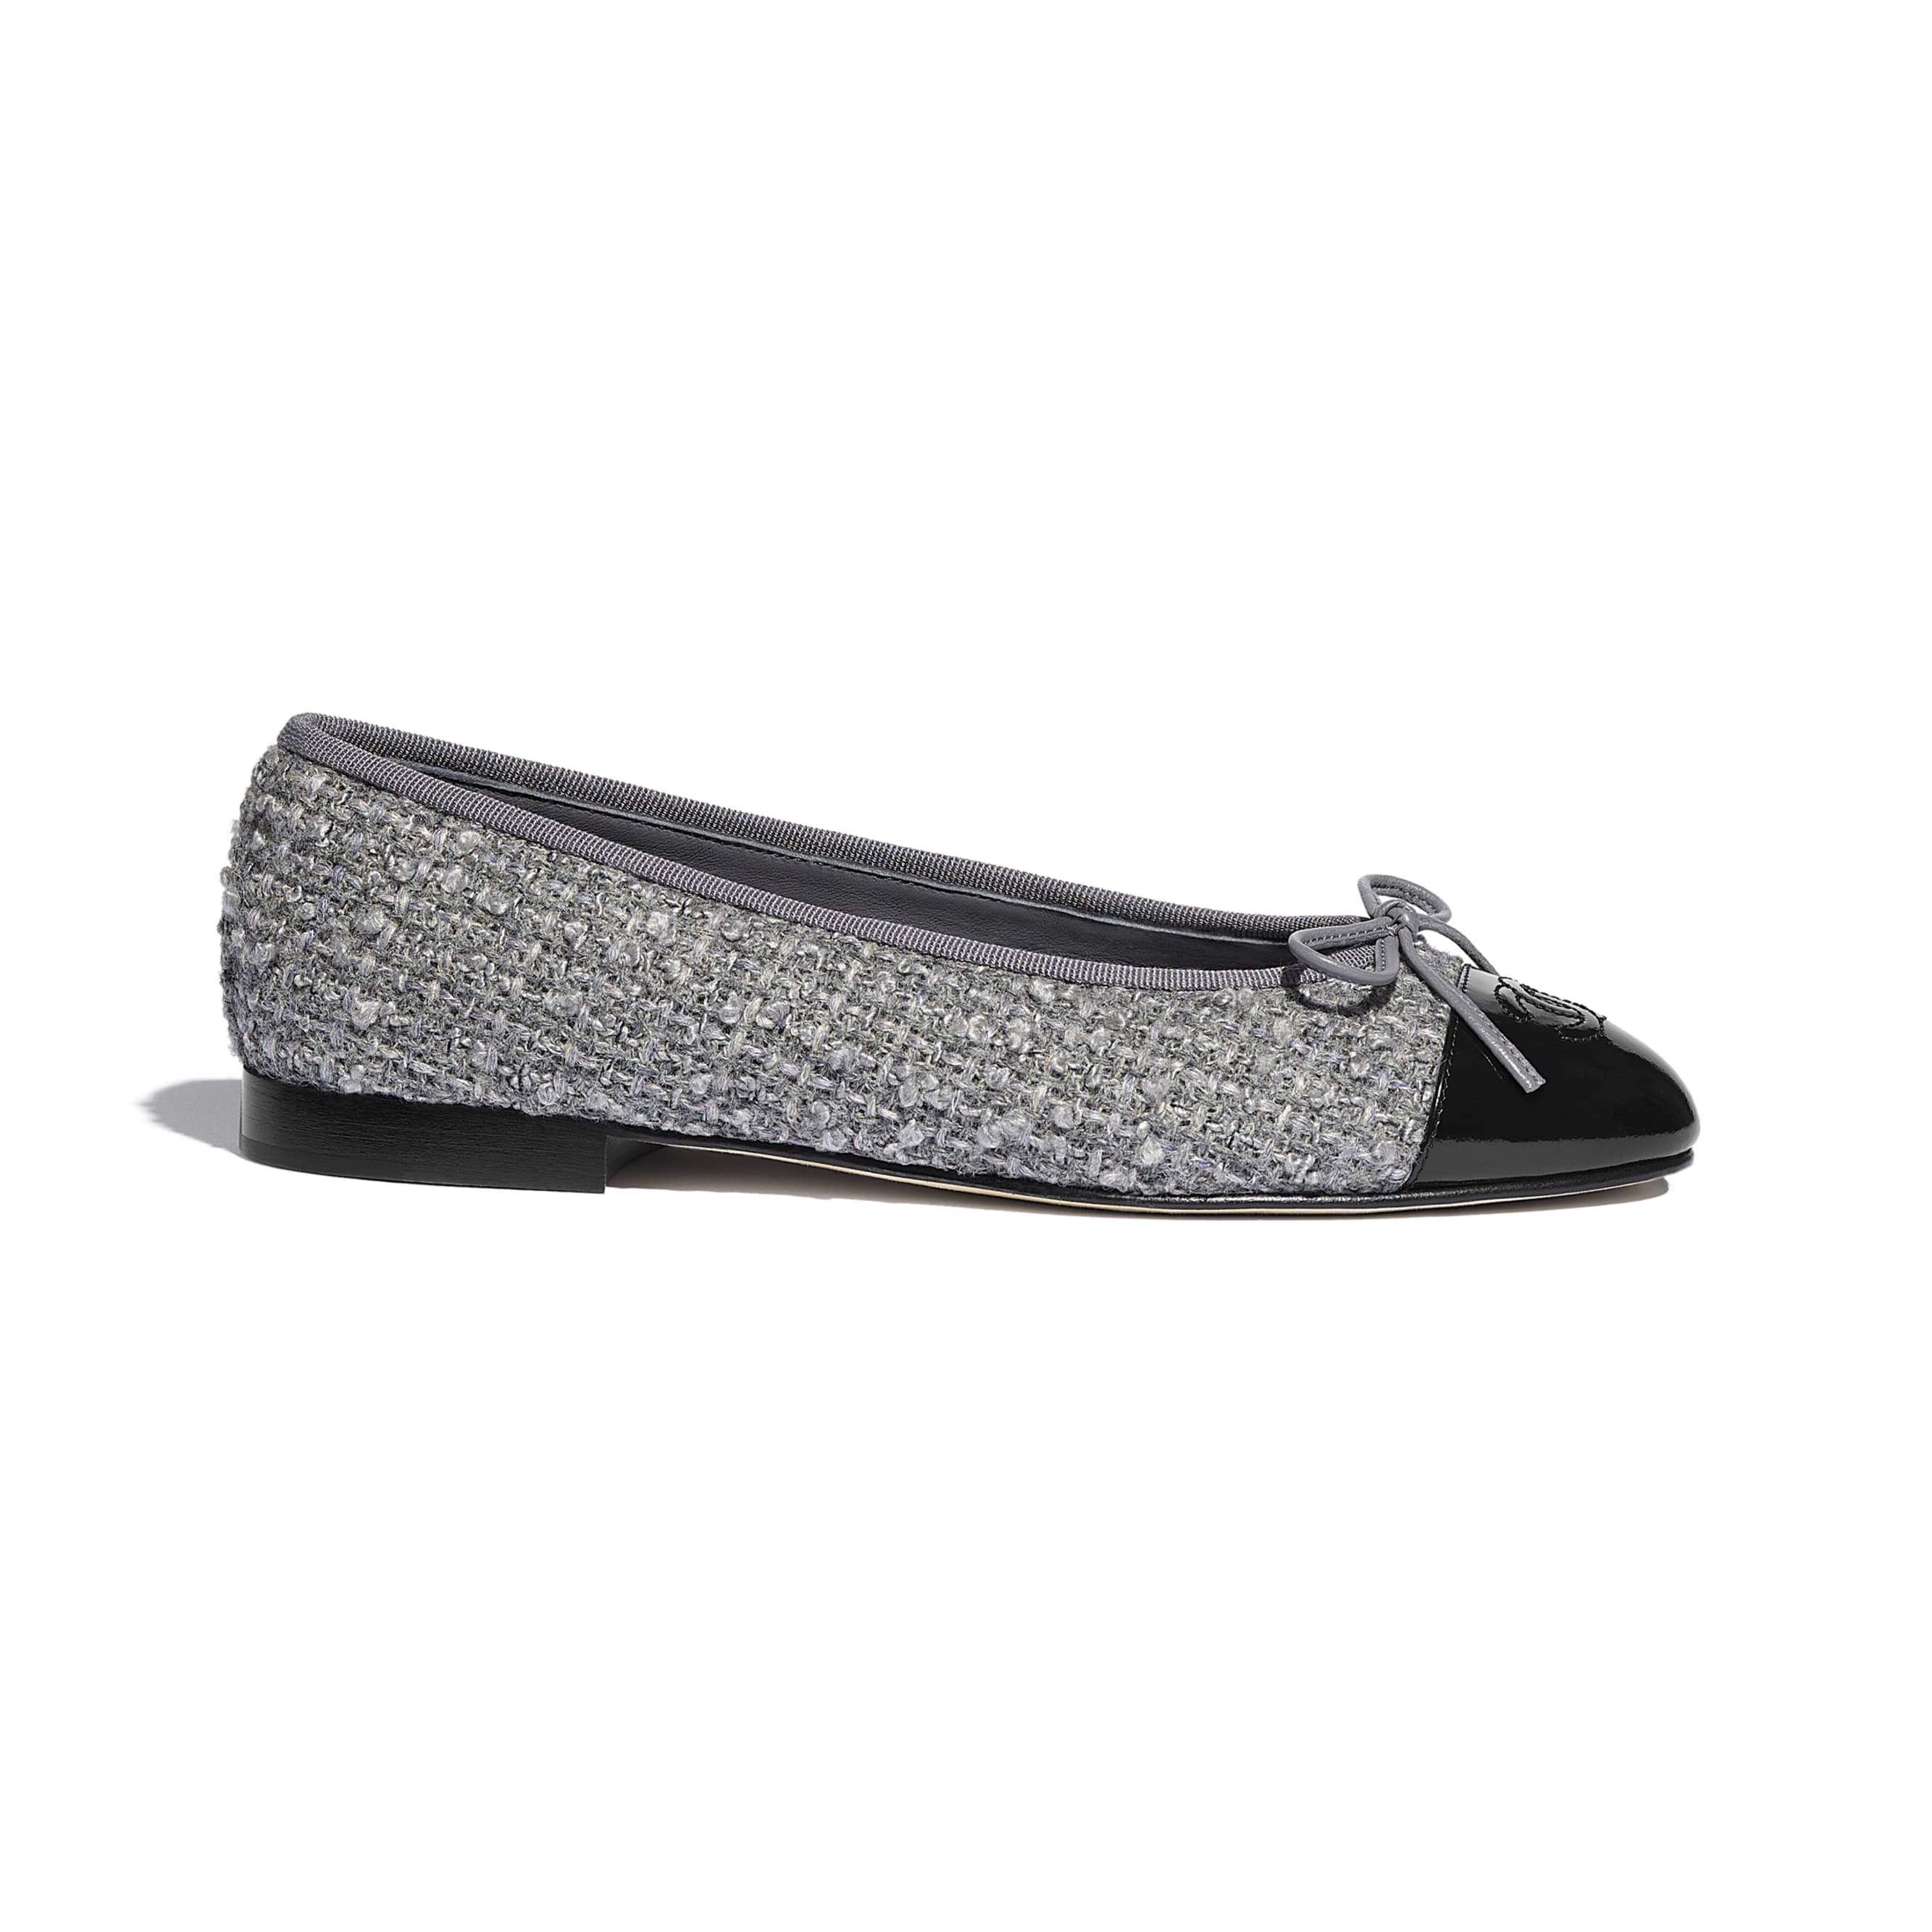 Ballerinas - Gray & Black - Tweed & Calfskin - CHANEL - Default view - see standard sized version